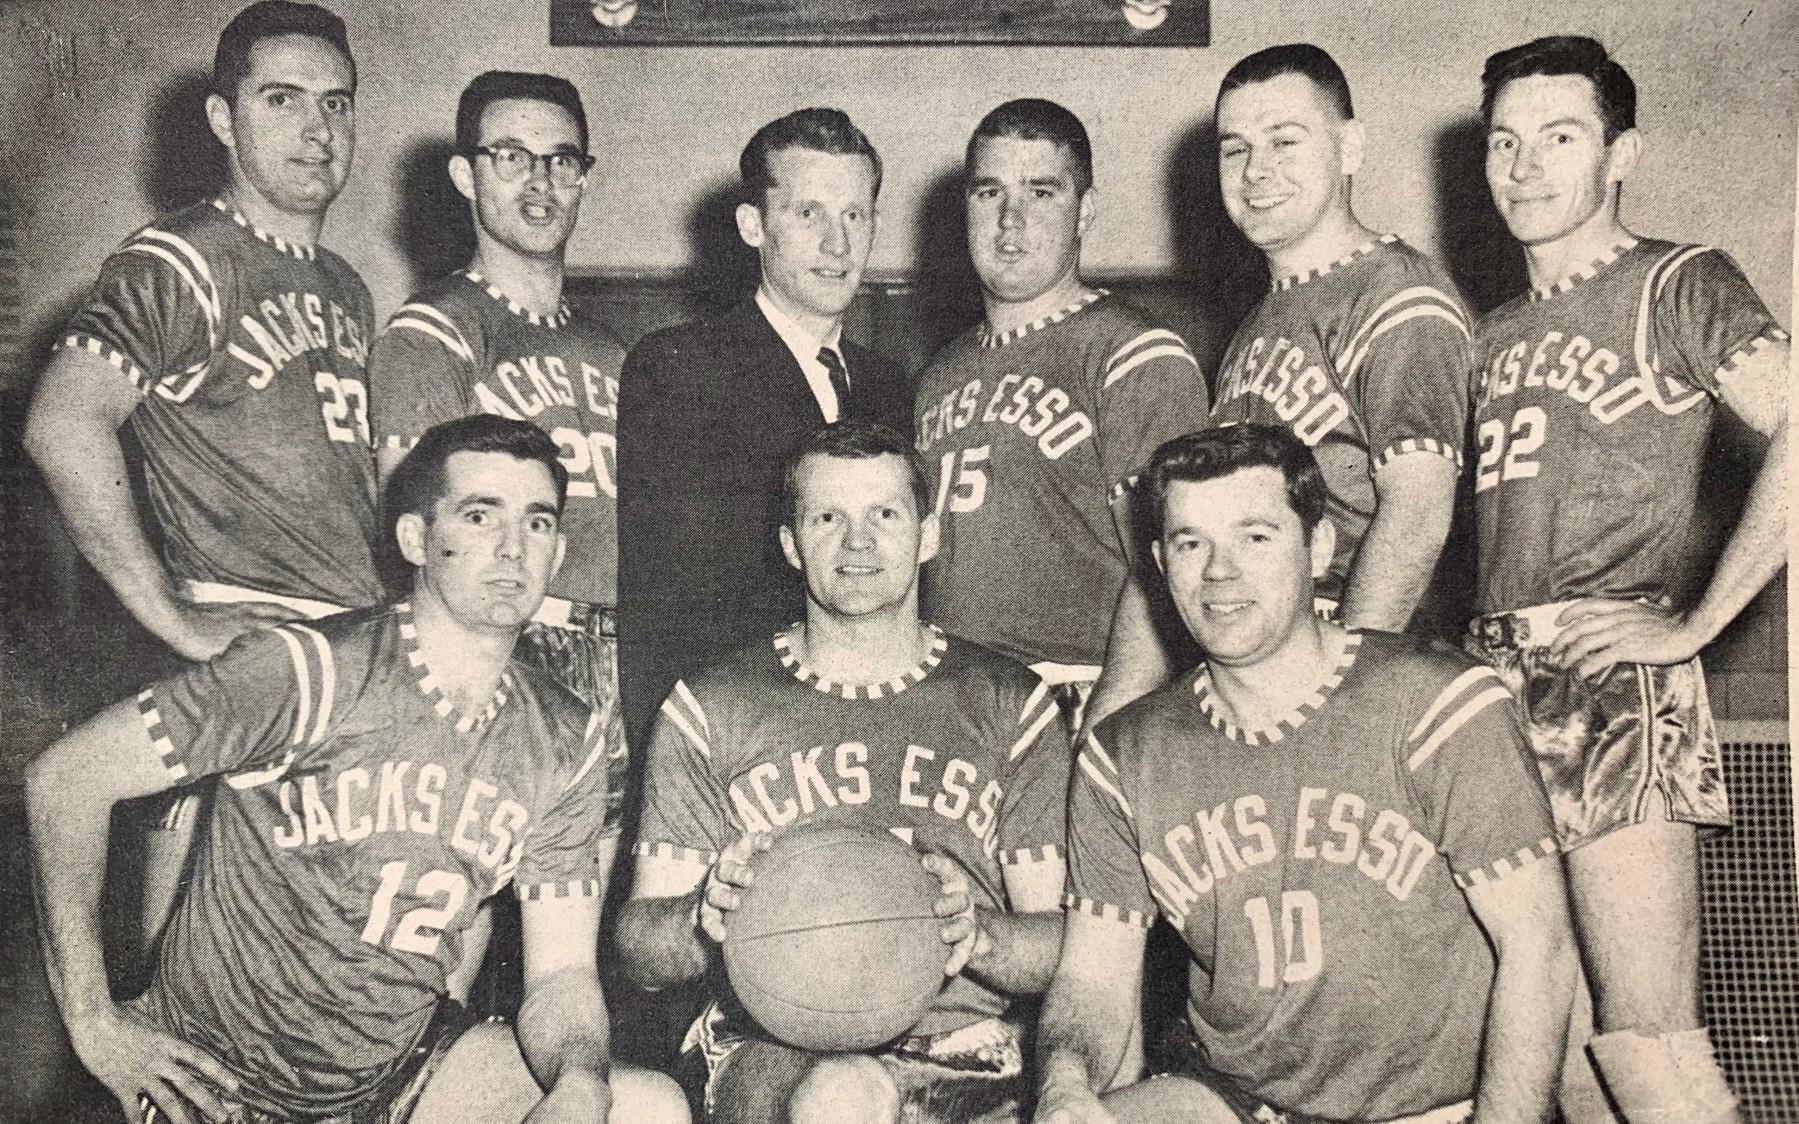 Jack Kilmartin's sponsored basketball team Burlington MA